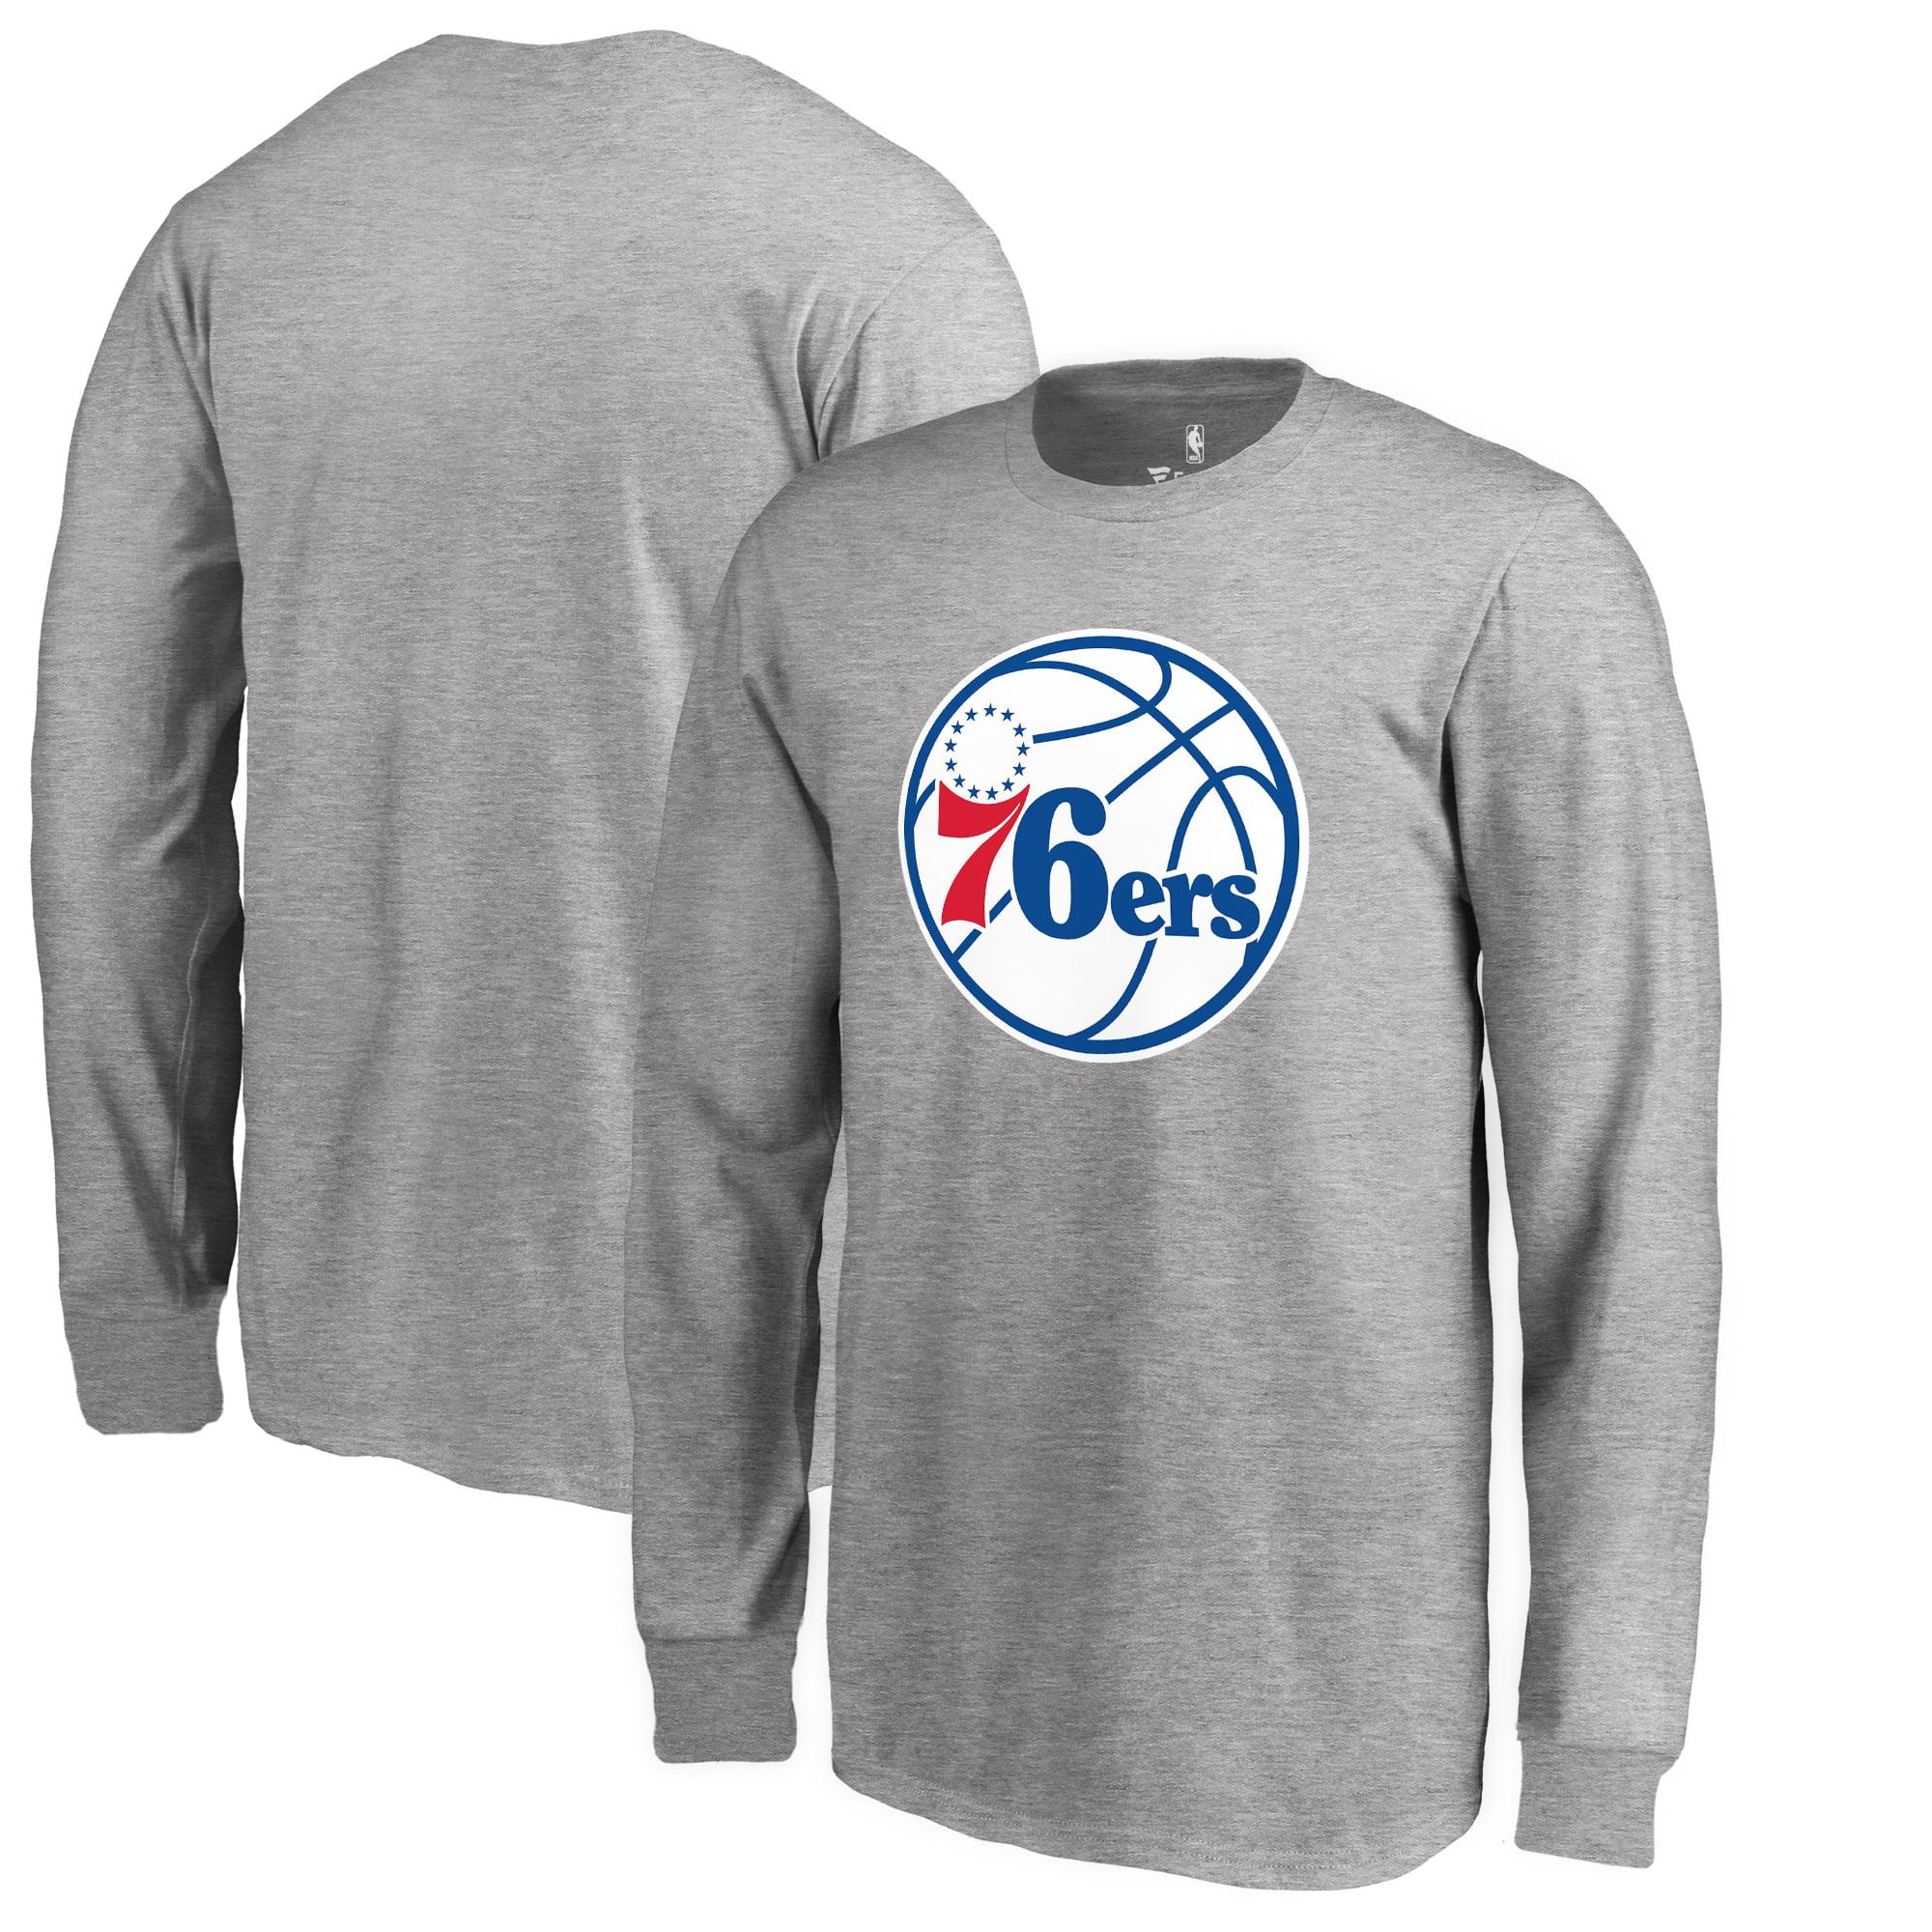 Philadelphia 76ers Fanatics Branded Youth Primary Logo Long Sleeve T-Shirt - Heathered Gray